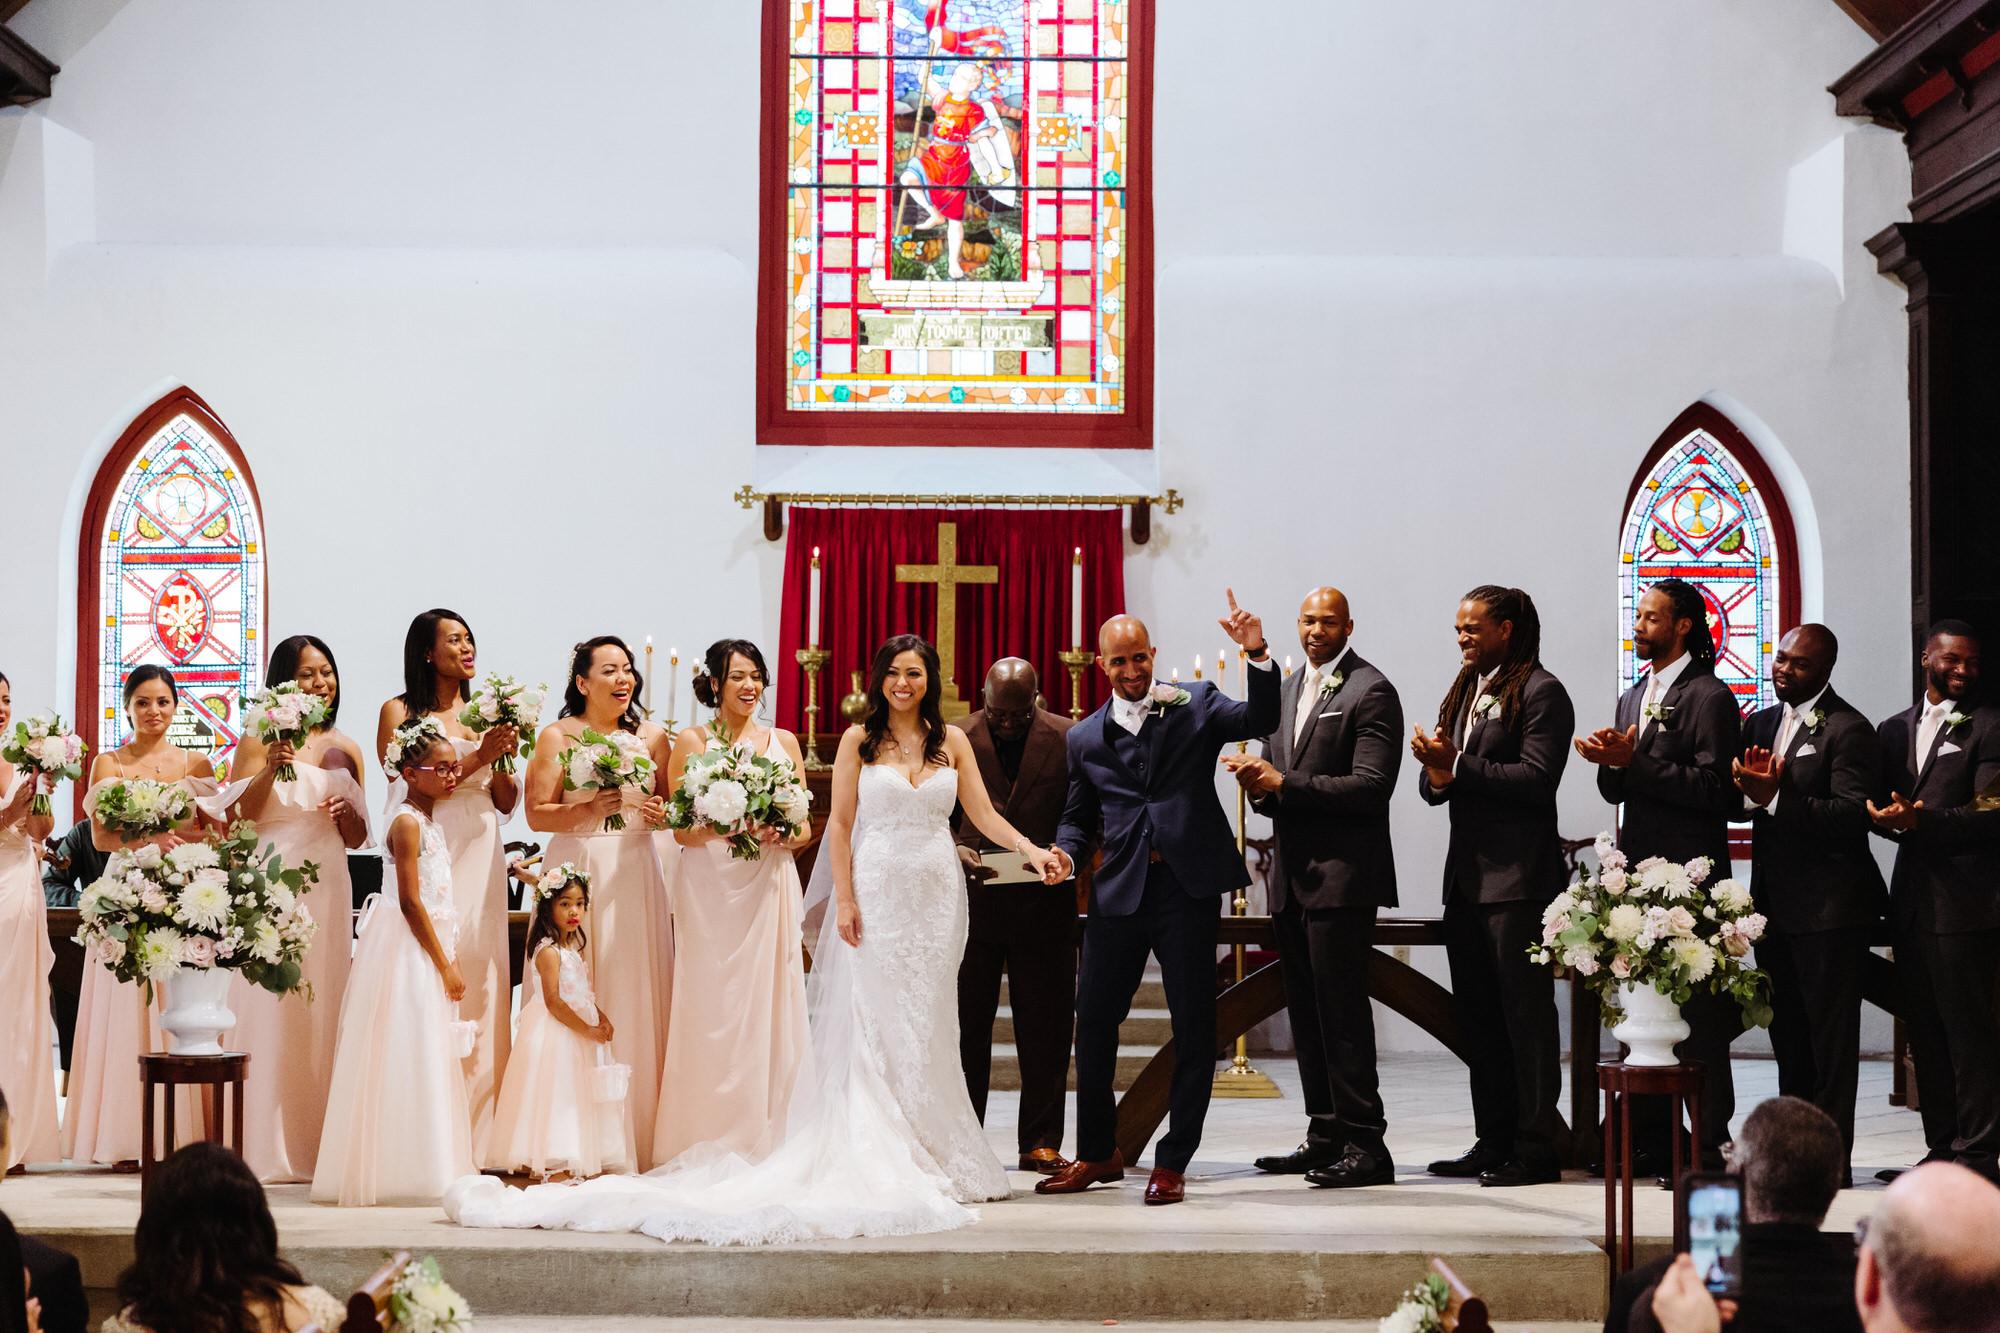 st-lukes-chapel-cannon-green-charleston-wedding-930.JPG